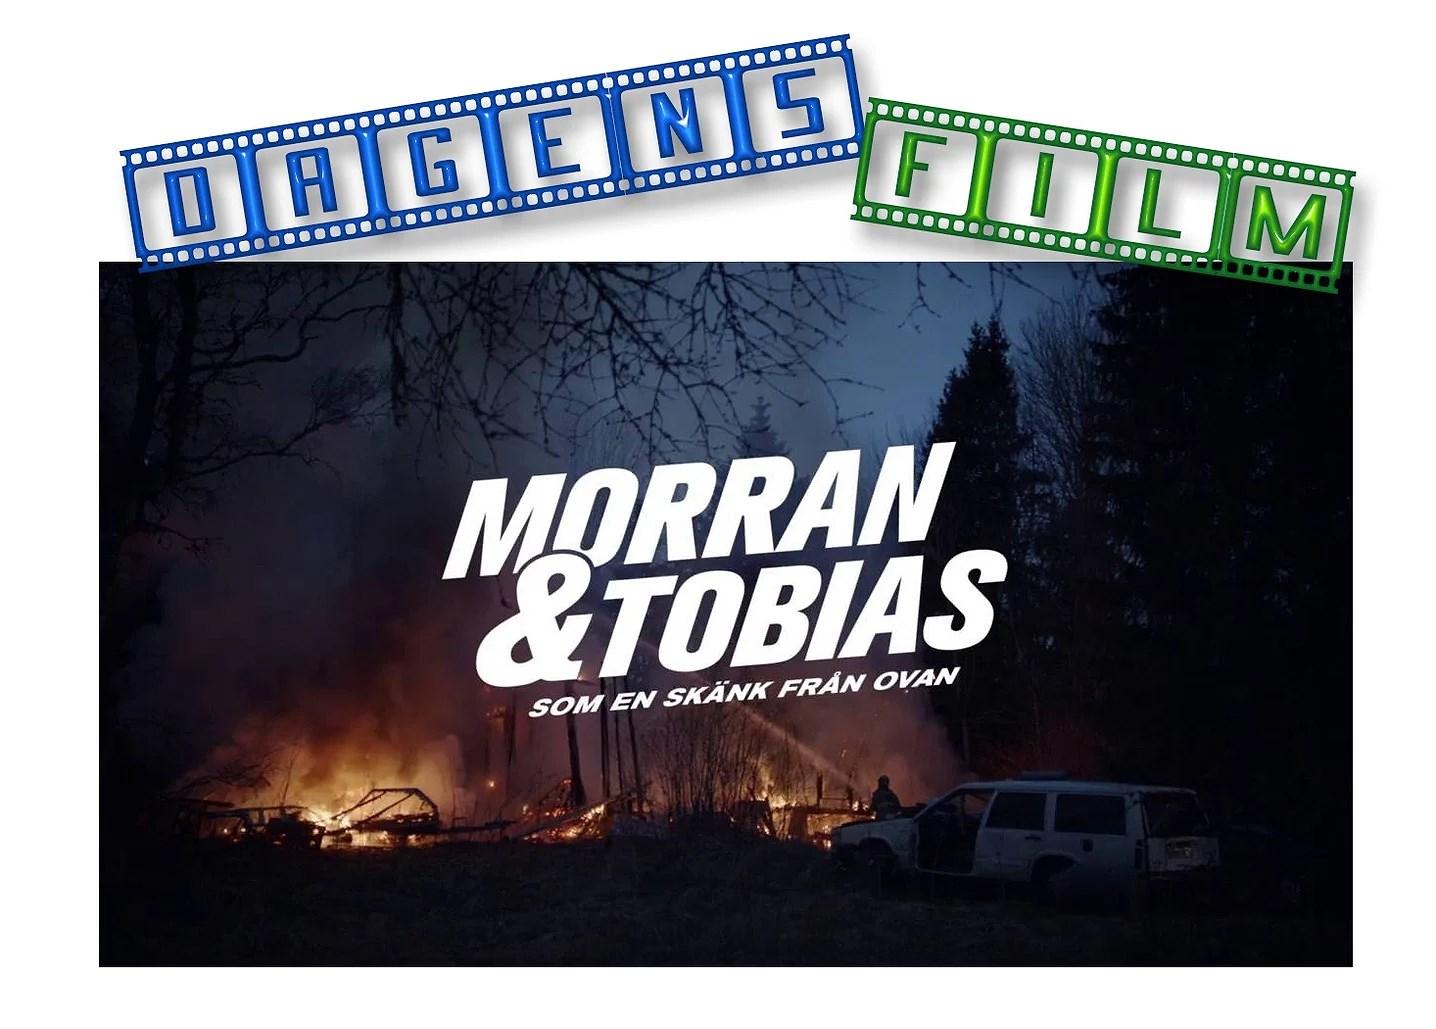 Morgan & Tobias som en skänk från ovan